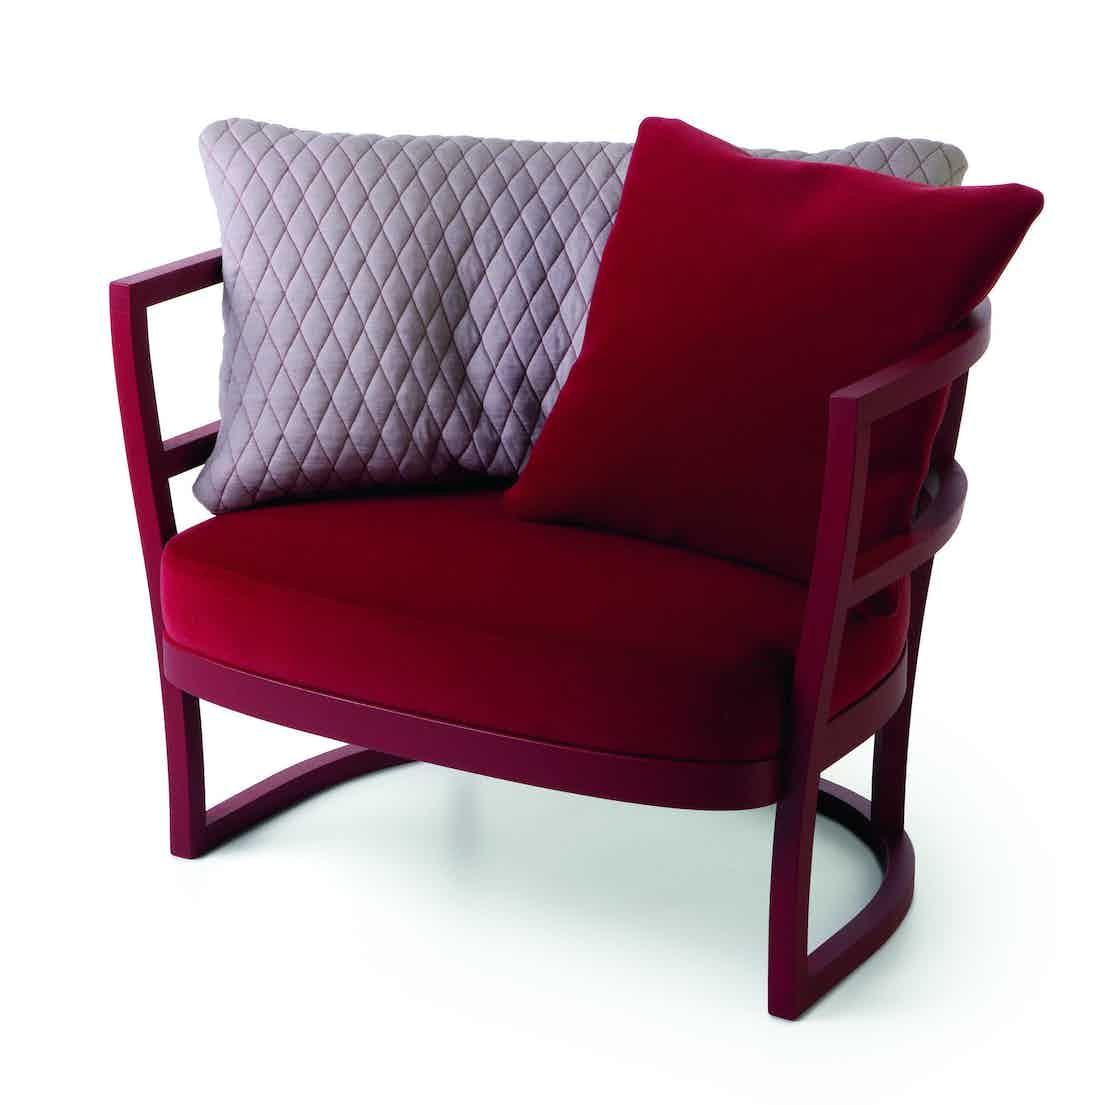 Dum-furniture-red-wagner-haute-living_190319_173732